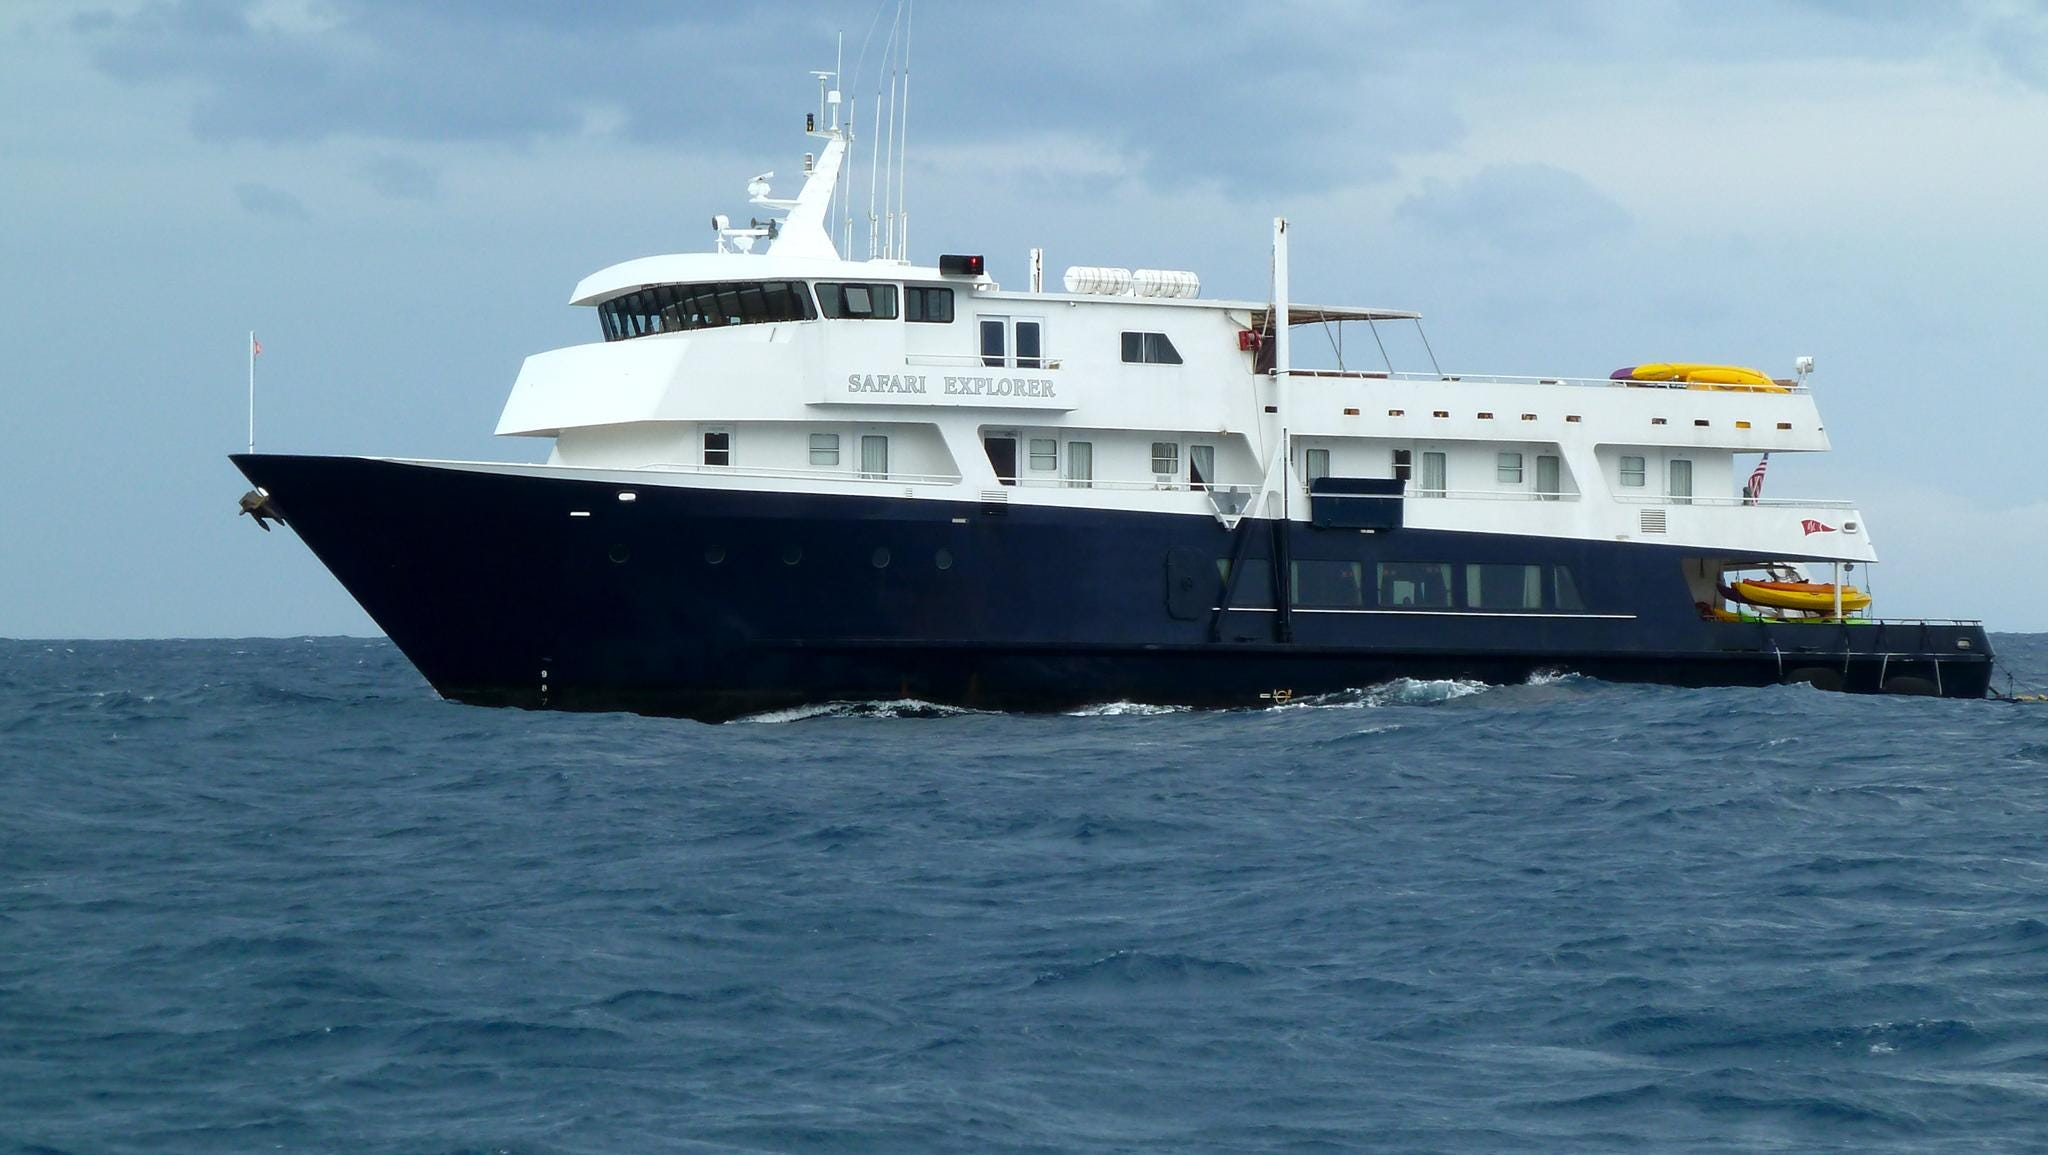 In 2012, the Safari Explorer began a new seven-night winter Hawaiian itinerary, sailing between Lana'i and the big island of Hawai'i with an emphasis on Hawaiian culture and marine life.